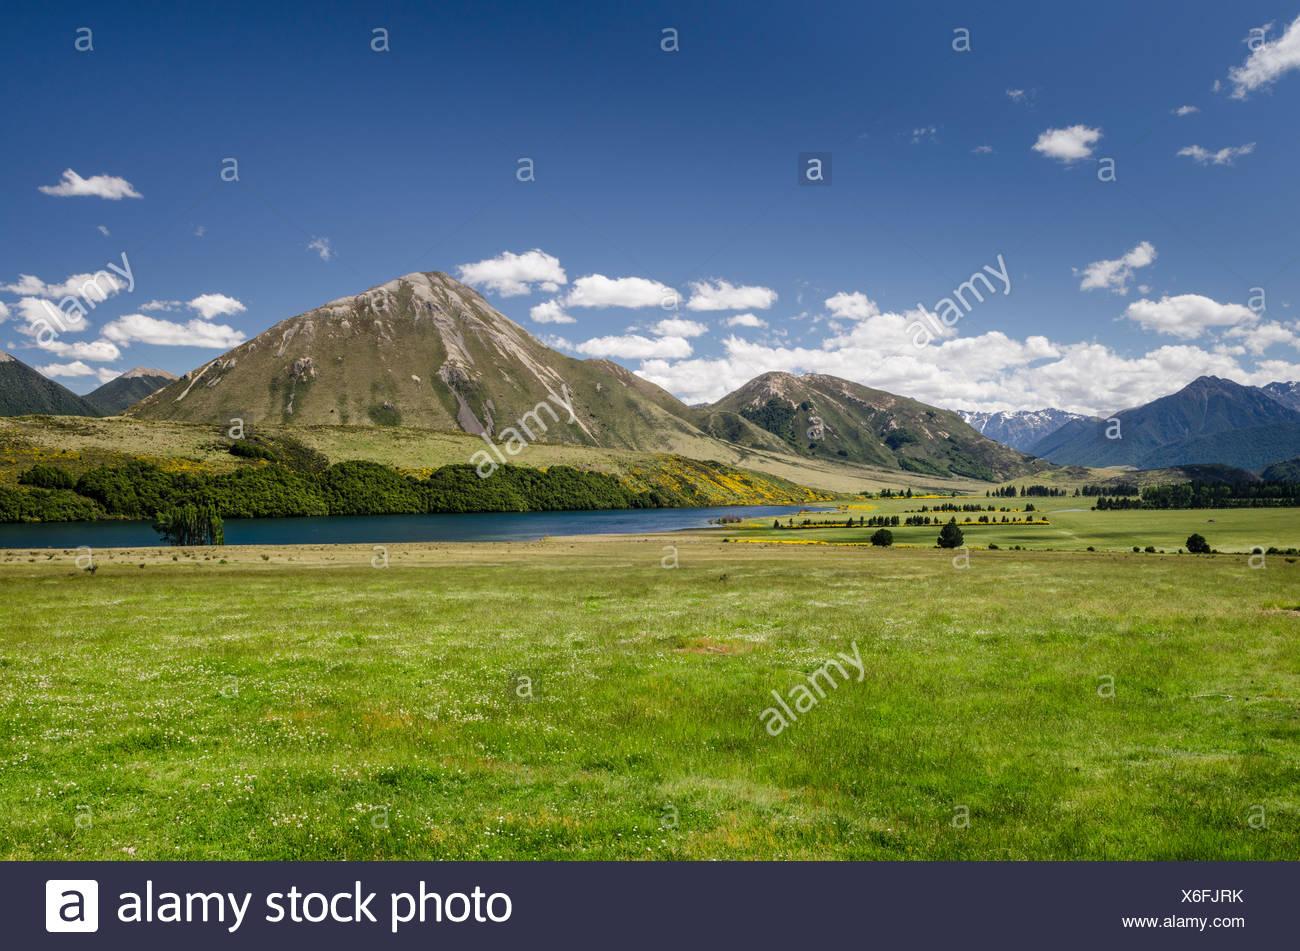 Mountains and meadows, Craigieburn Range, Porters Pass, Canterbury, South Island, New Zealand, Oceania - Stock Image